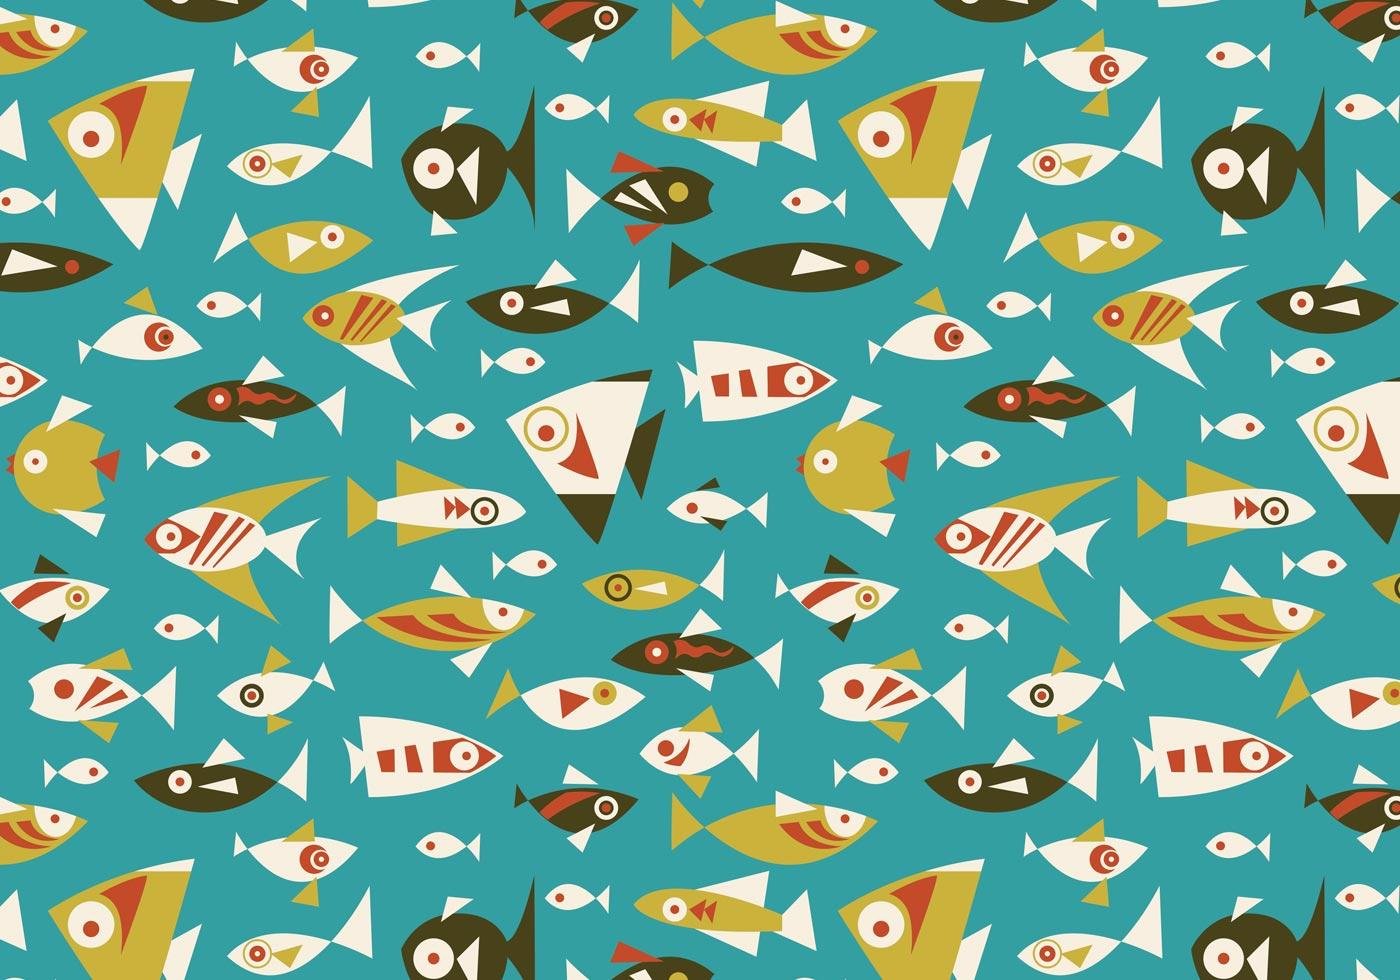 Retro Fish Seamless Vector Pattern - Download Free Vectors